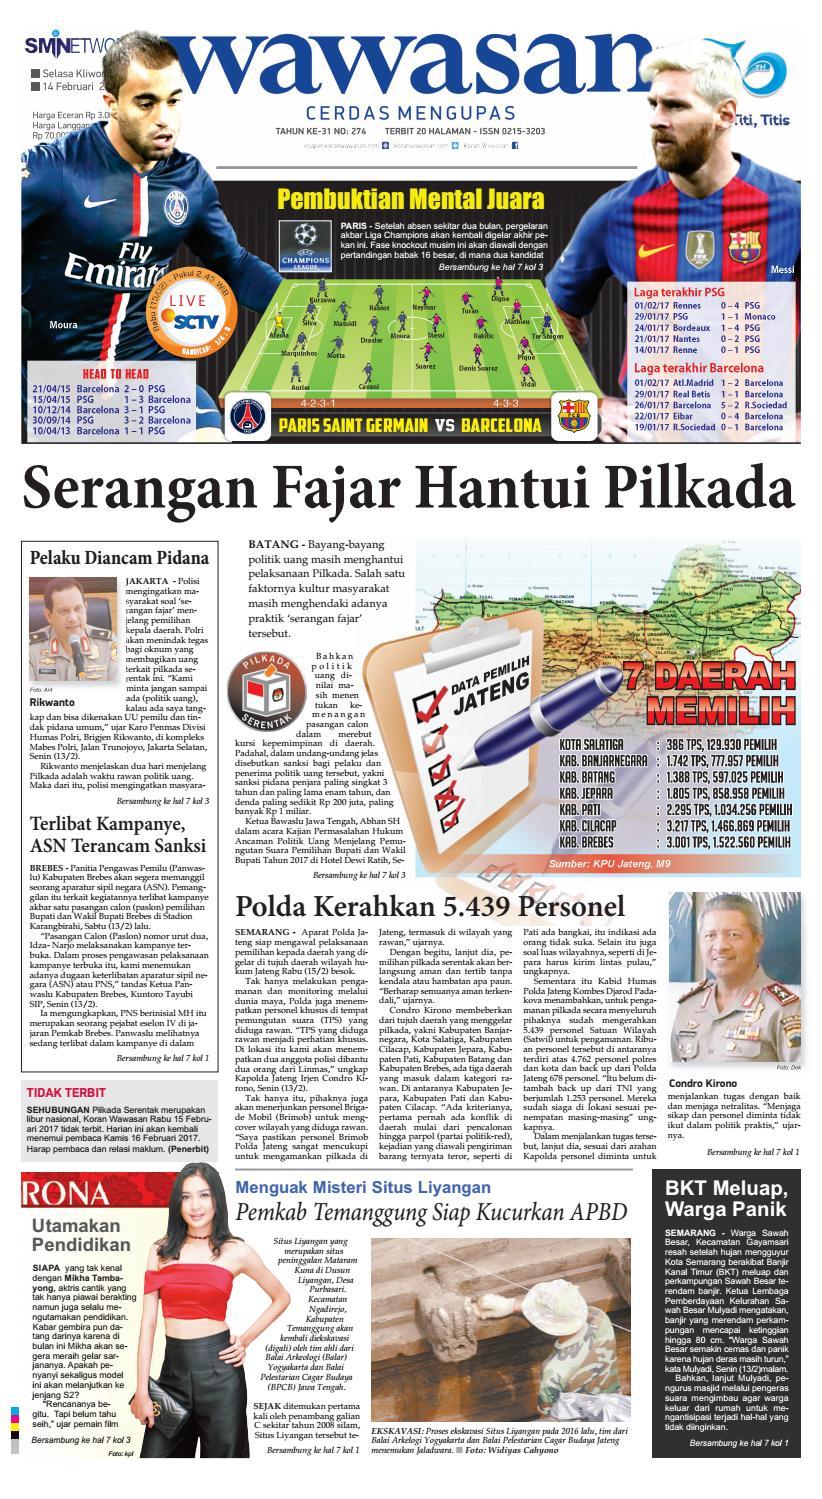 Wawasan 14 Februari 2017 By Koran Pagi Issuu Lg Kulkas Inverter Gn M572hphl 178cm Putih Bunga Khusus Jabodetabek